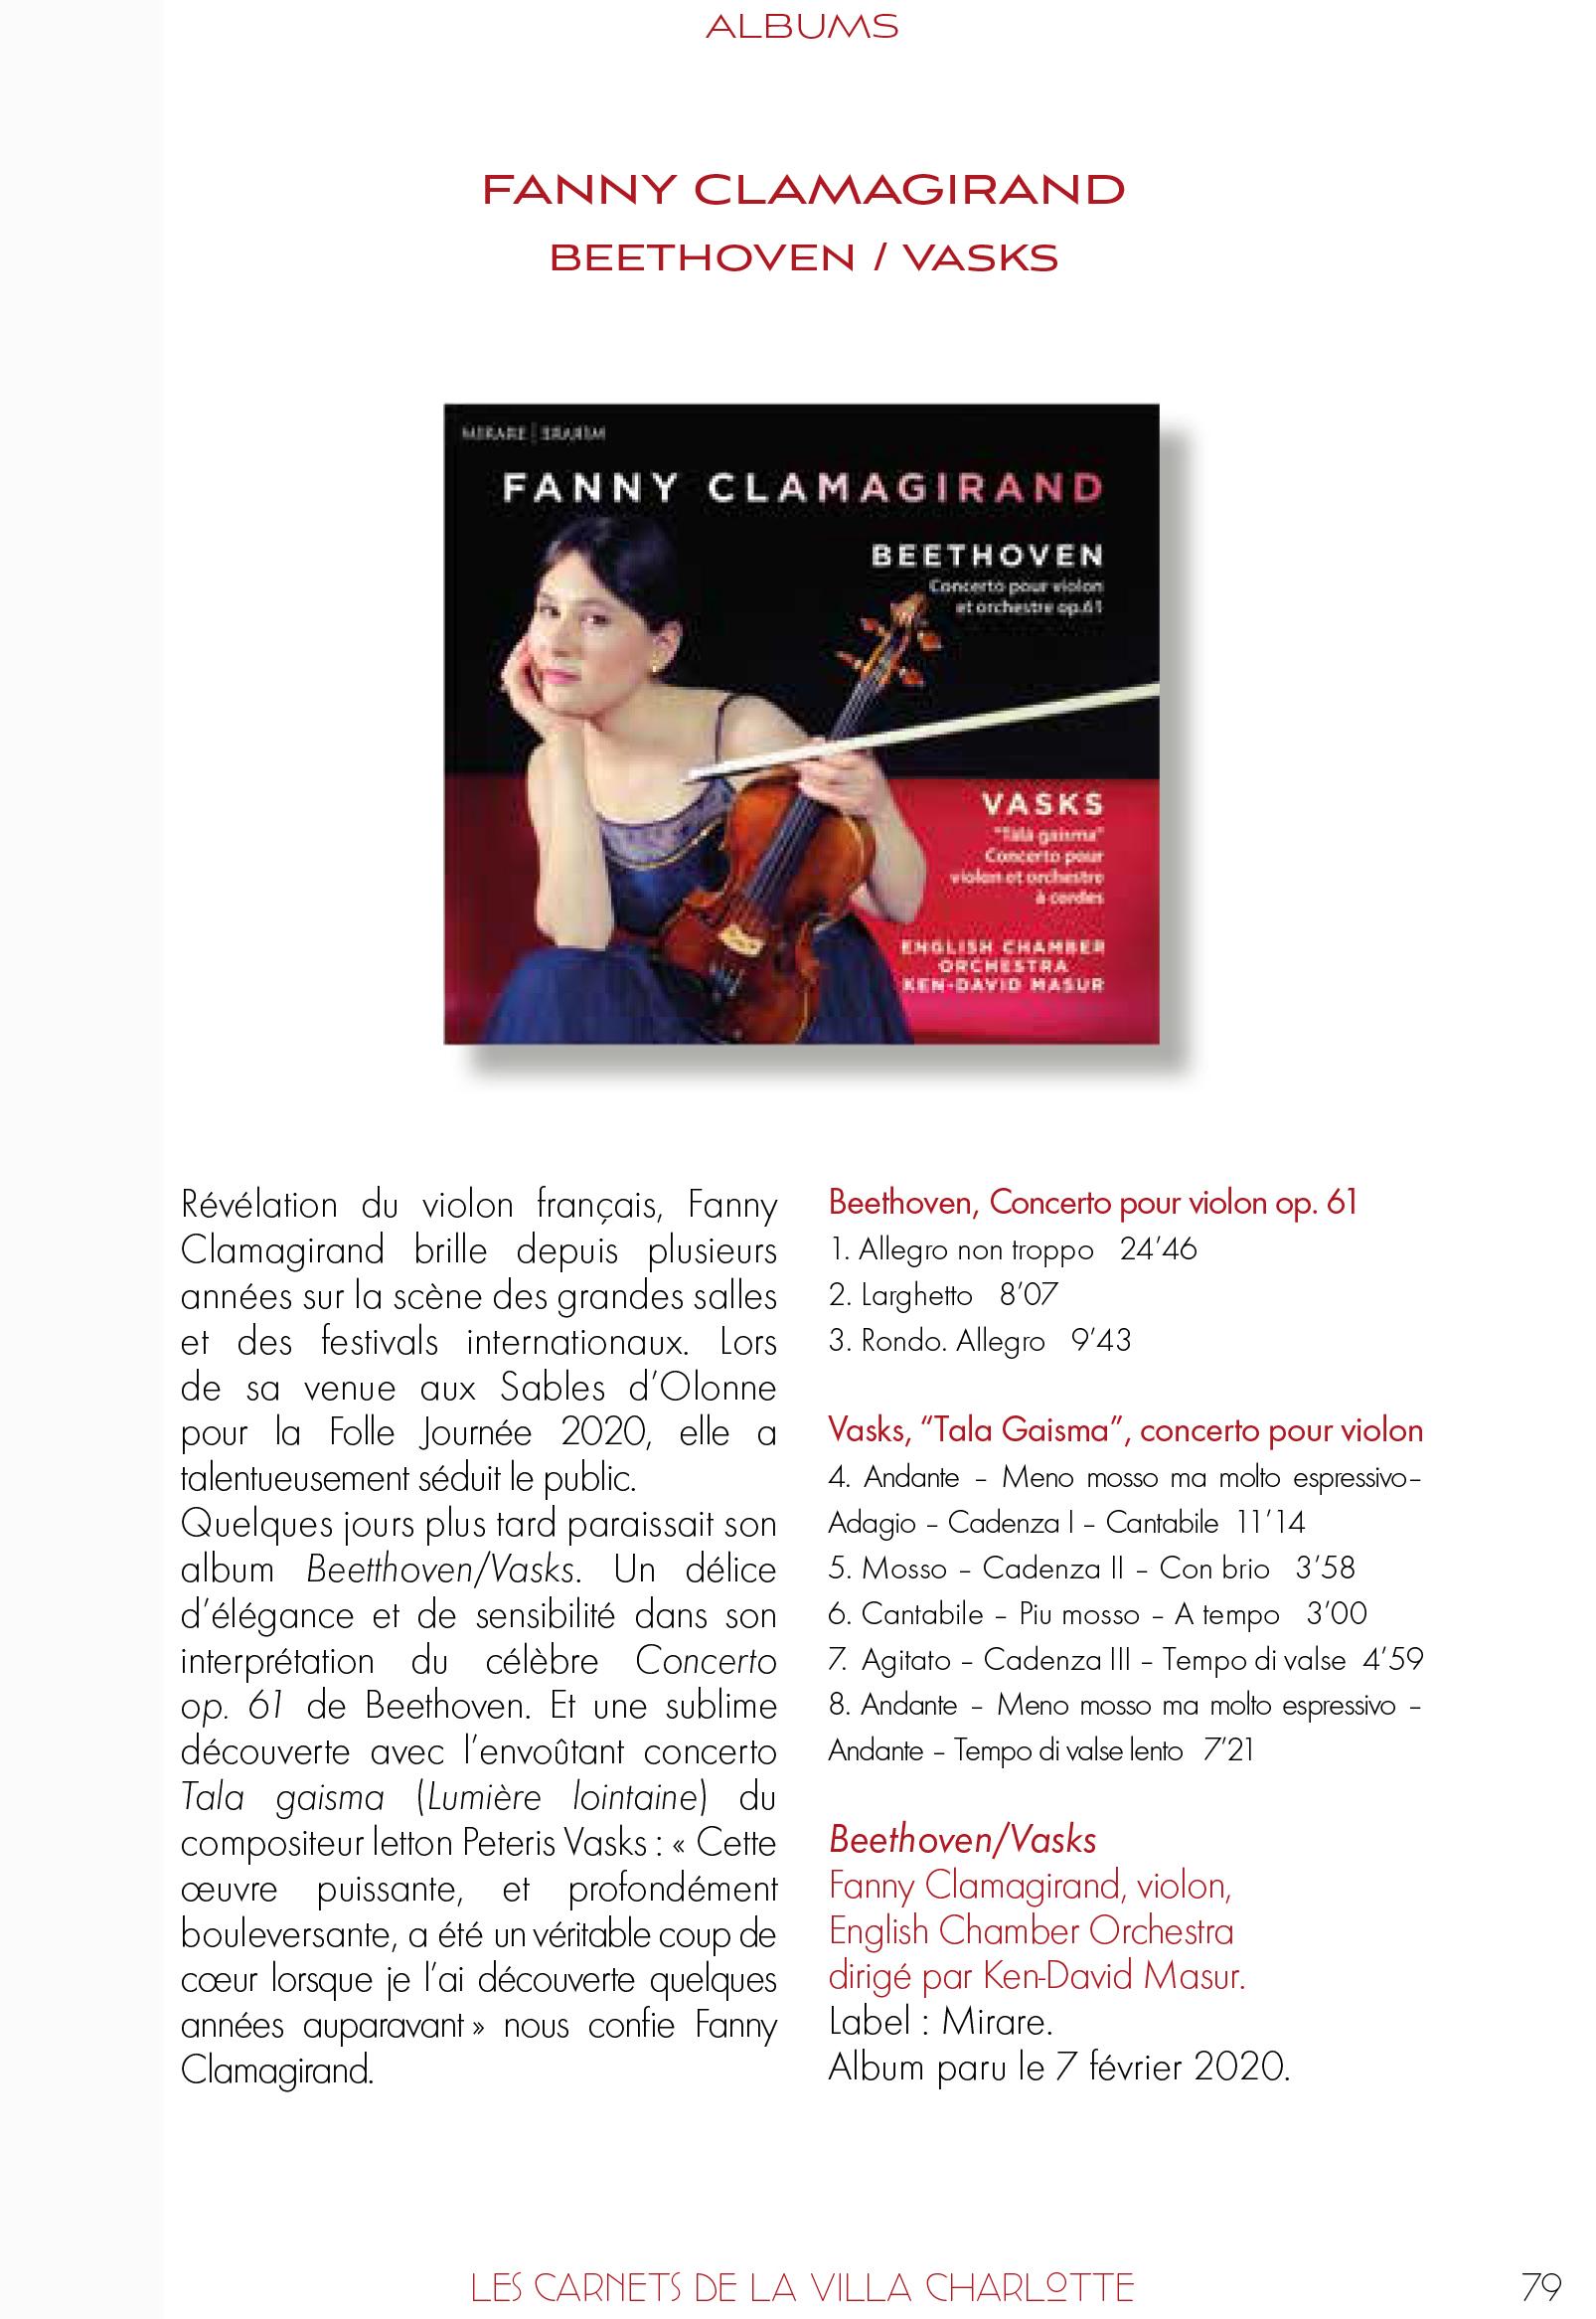 Nouvel album Fanny Clamagirand